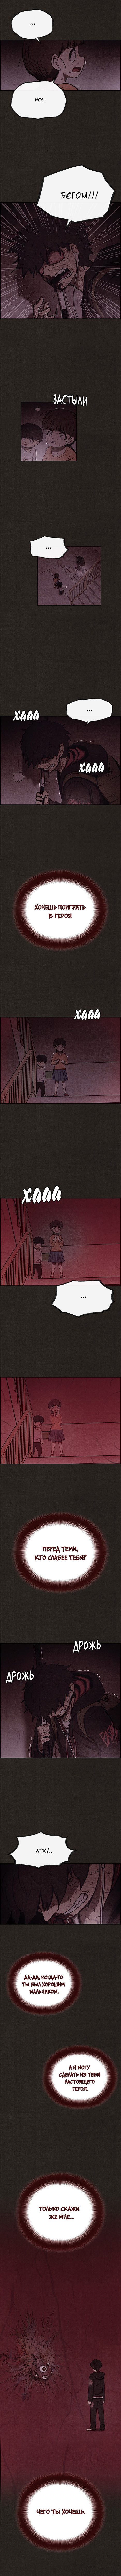 https://r1.ninemanga.com/comics/pic2/26/33050/435712/1537085658514.jpg Page 2